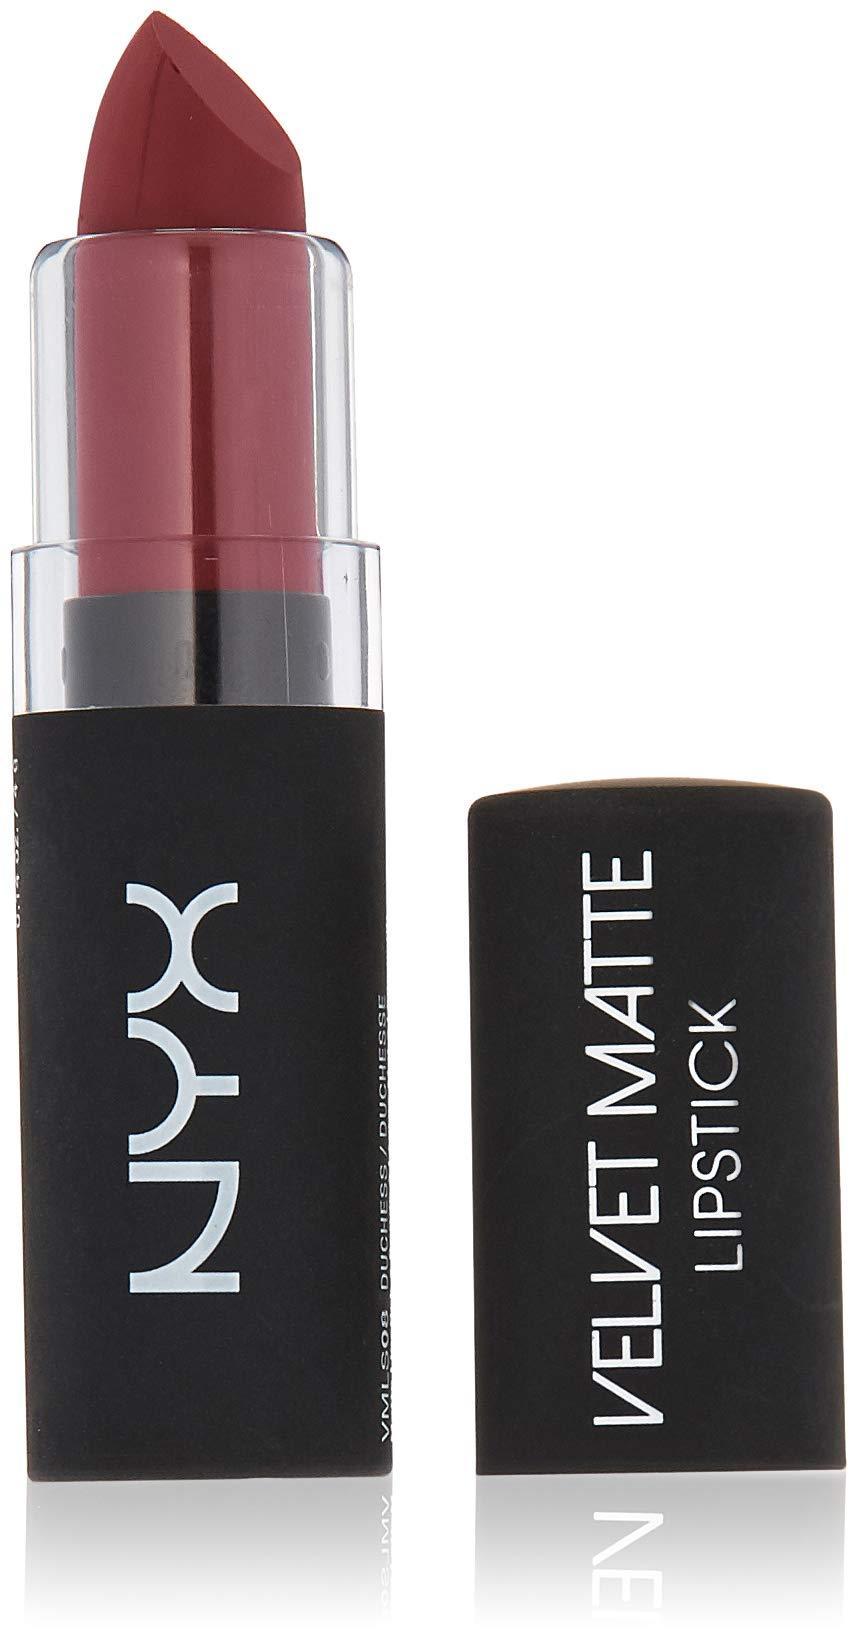 Velvet Matte Swatches: Amazon.com: NYX Professional Makeup Velvet Matte Lipstick